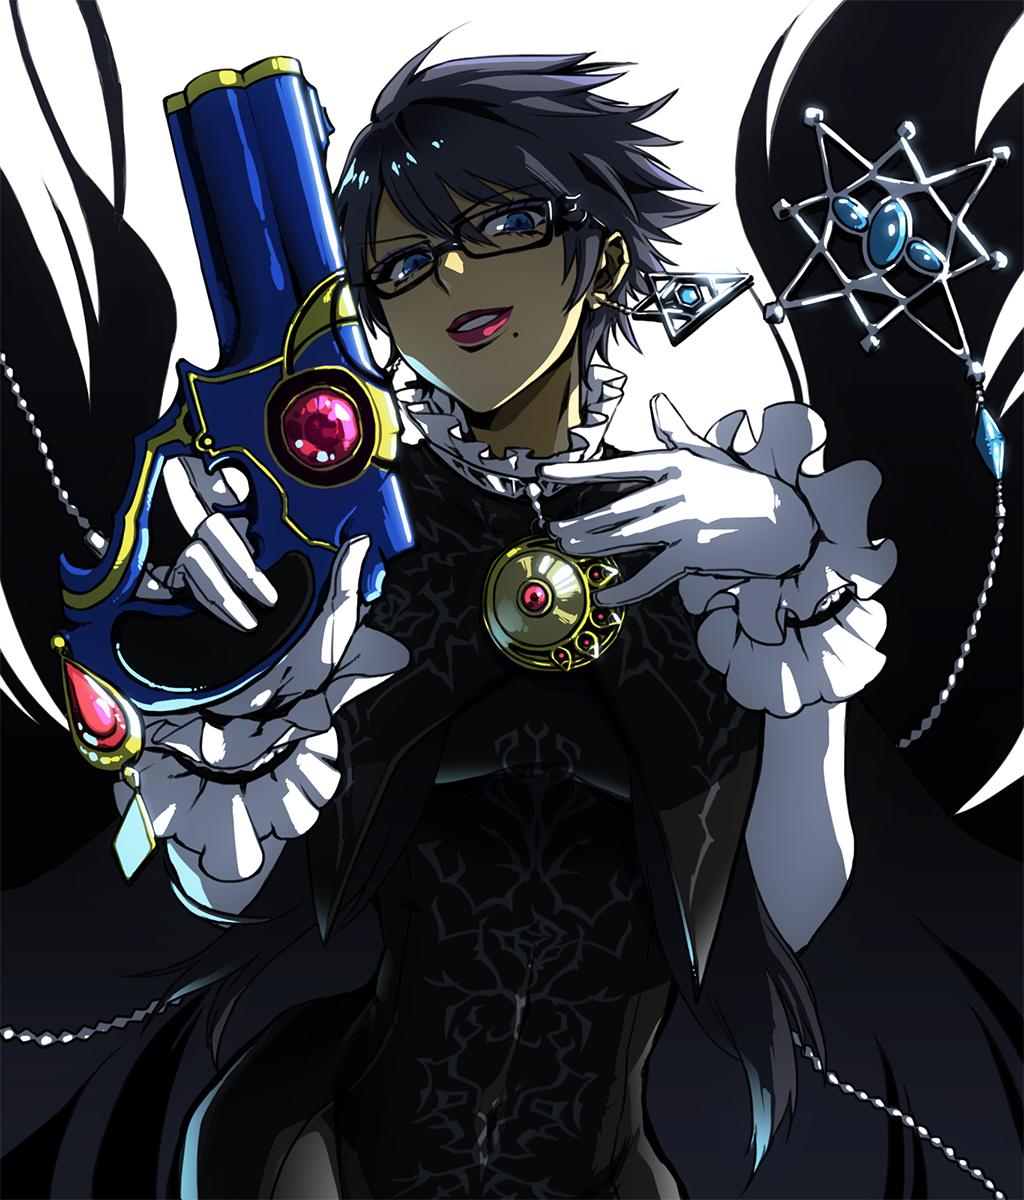 Anime Character 2 : Bayonetta zerochan anime image board